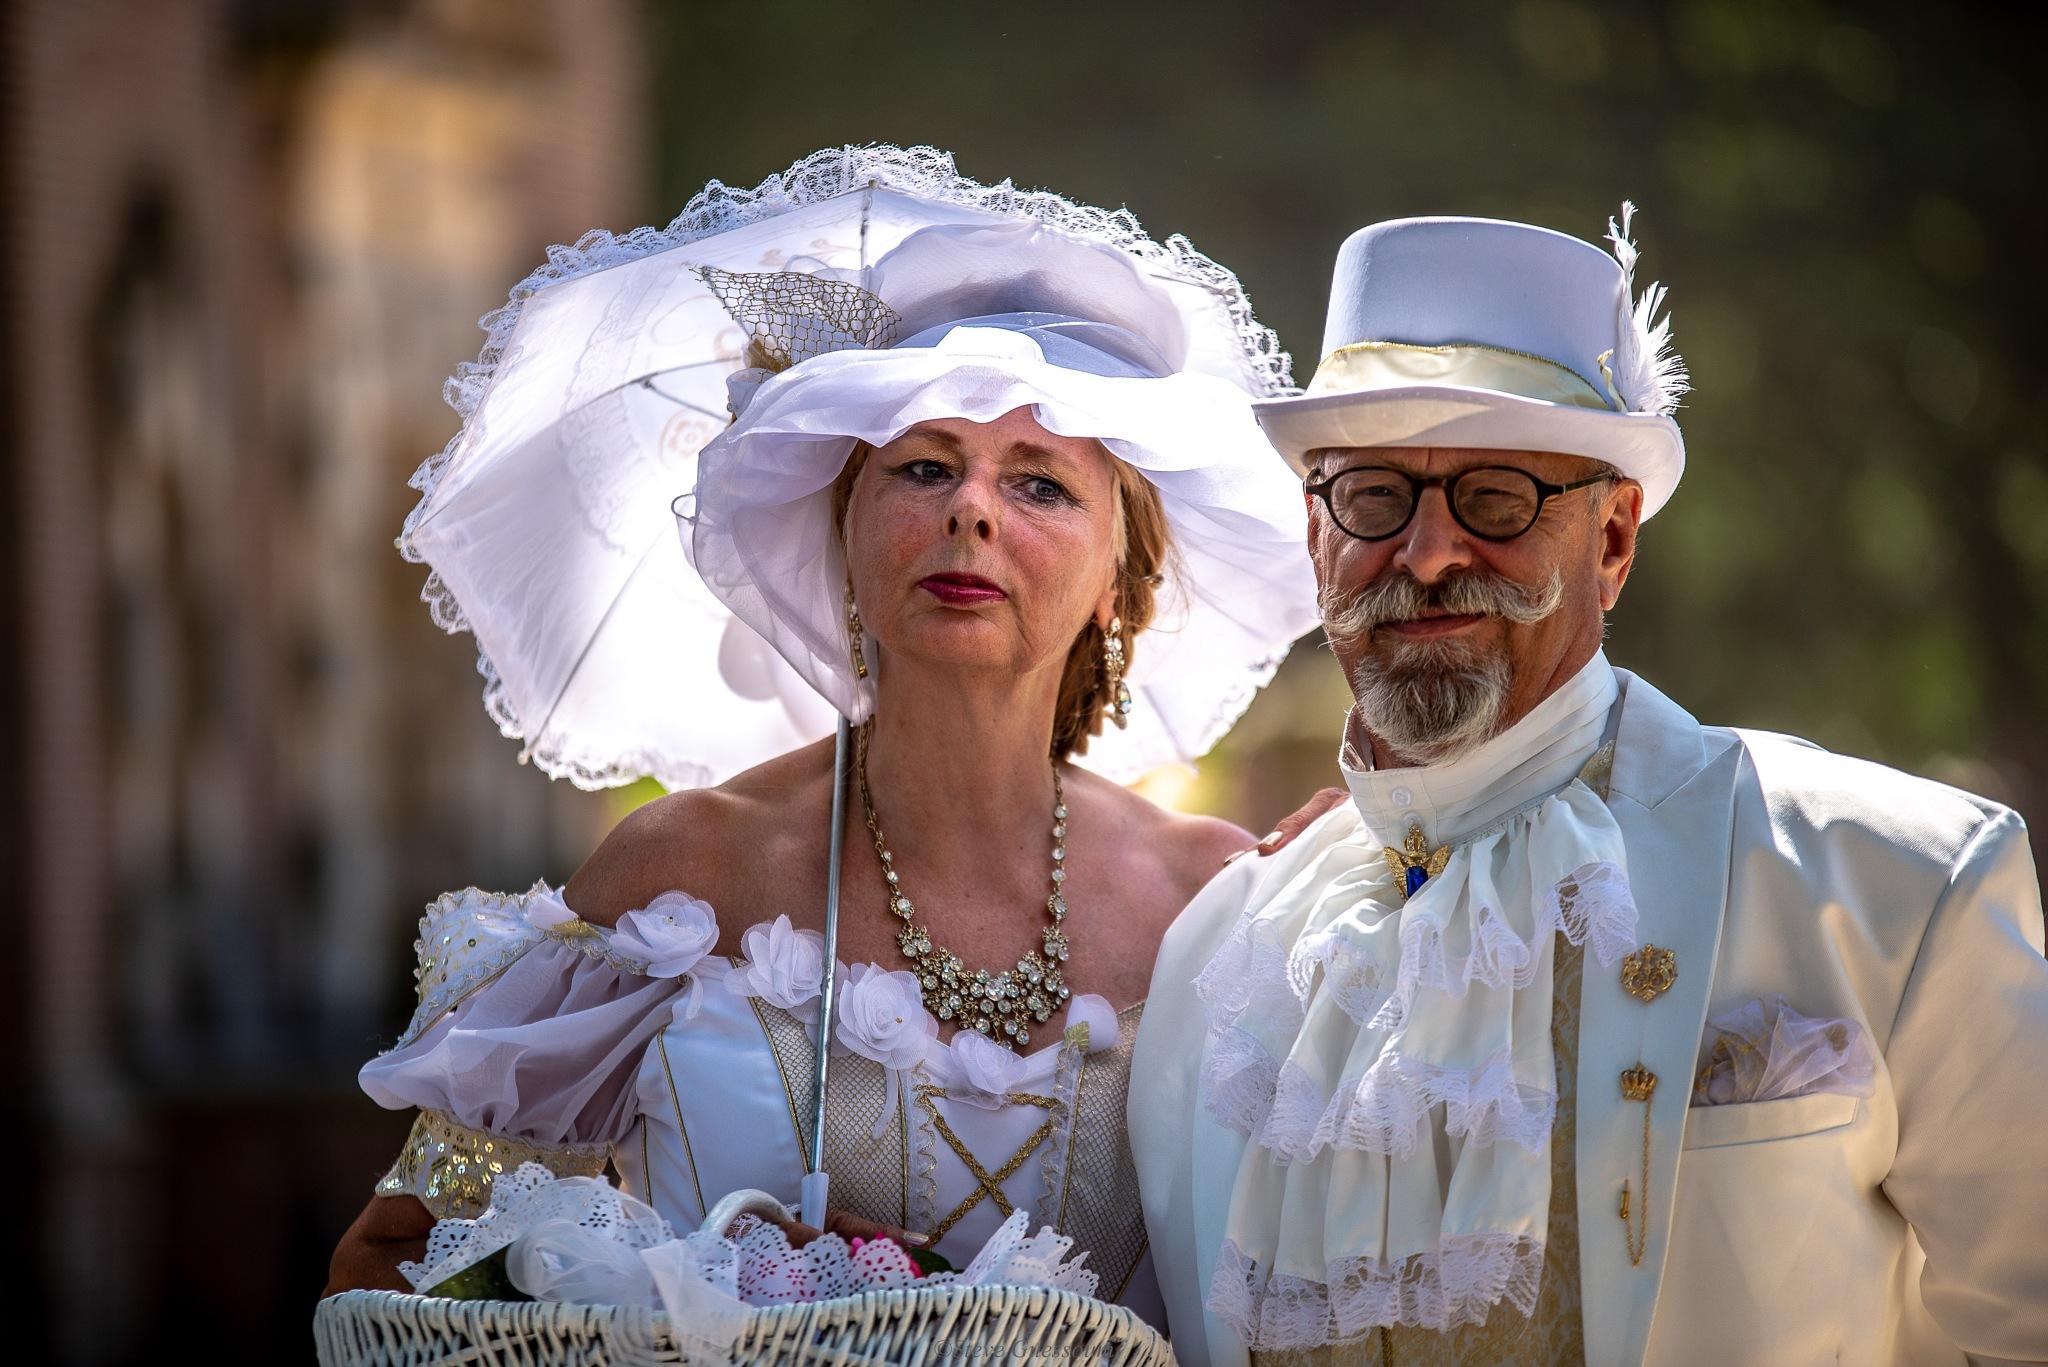 Castlefest summer festival 2018 by Steve Guessoum